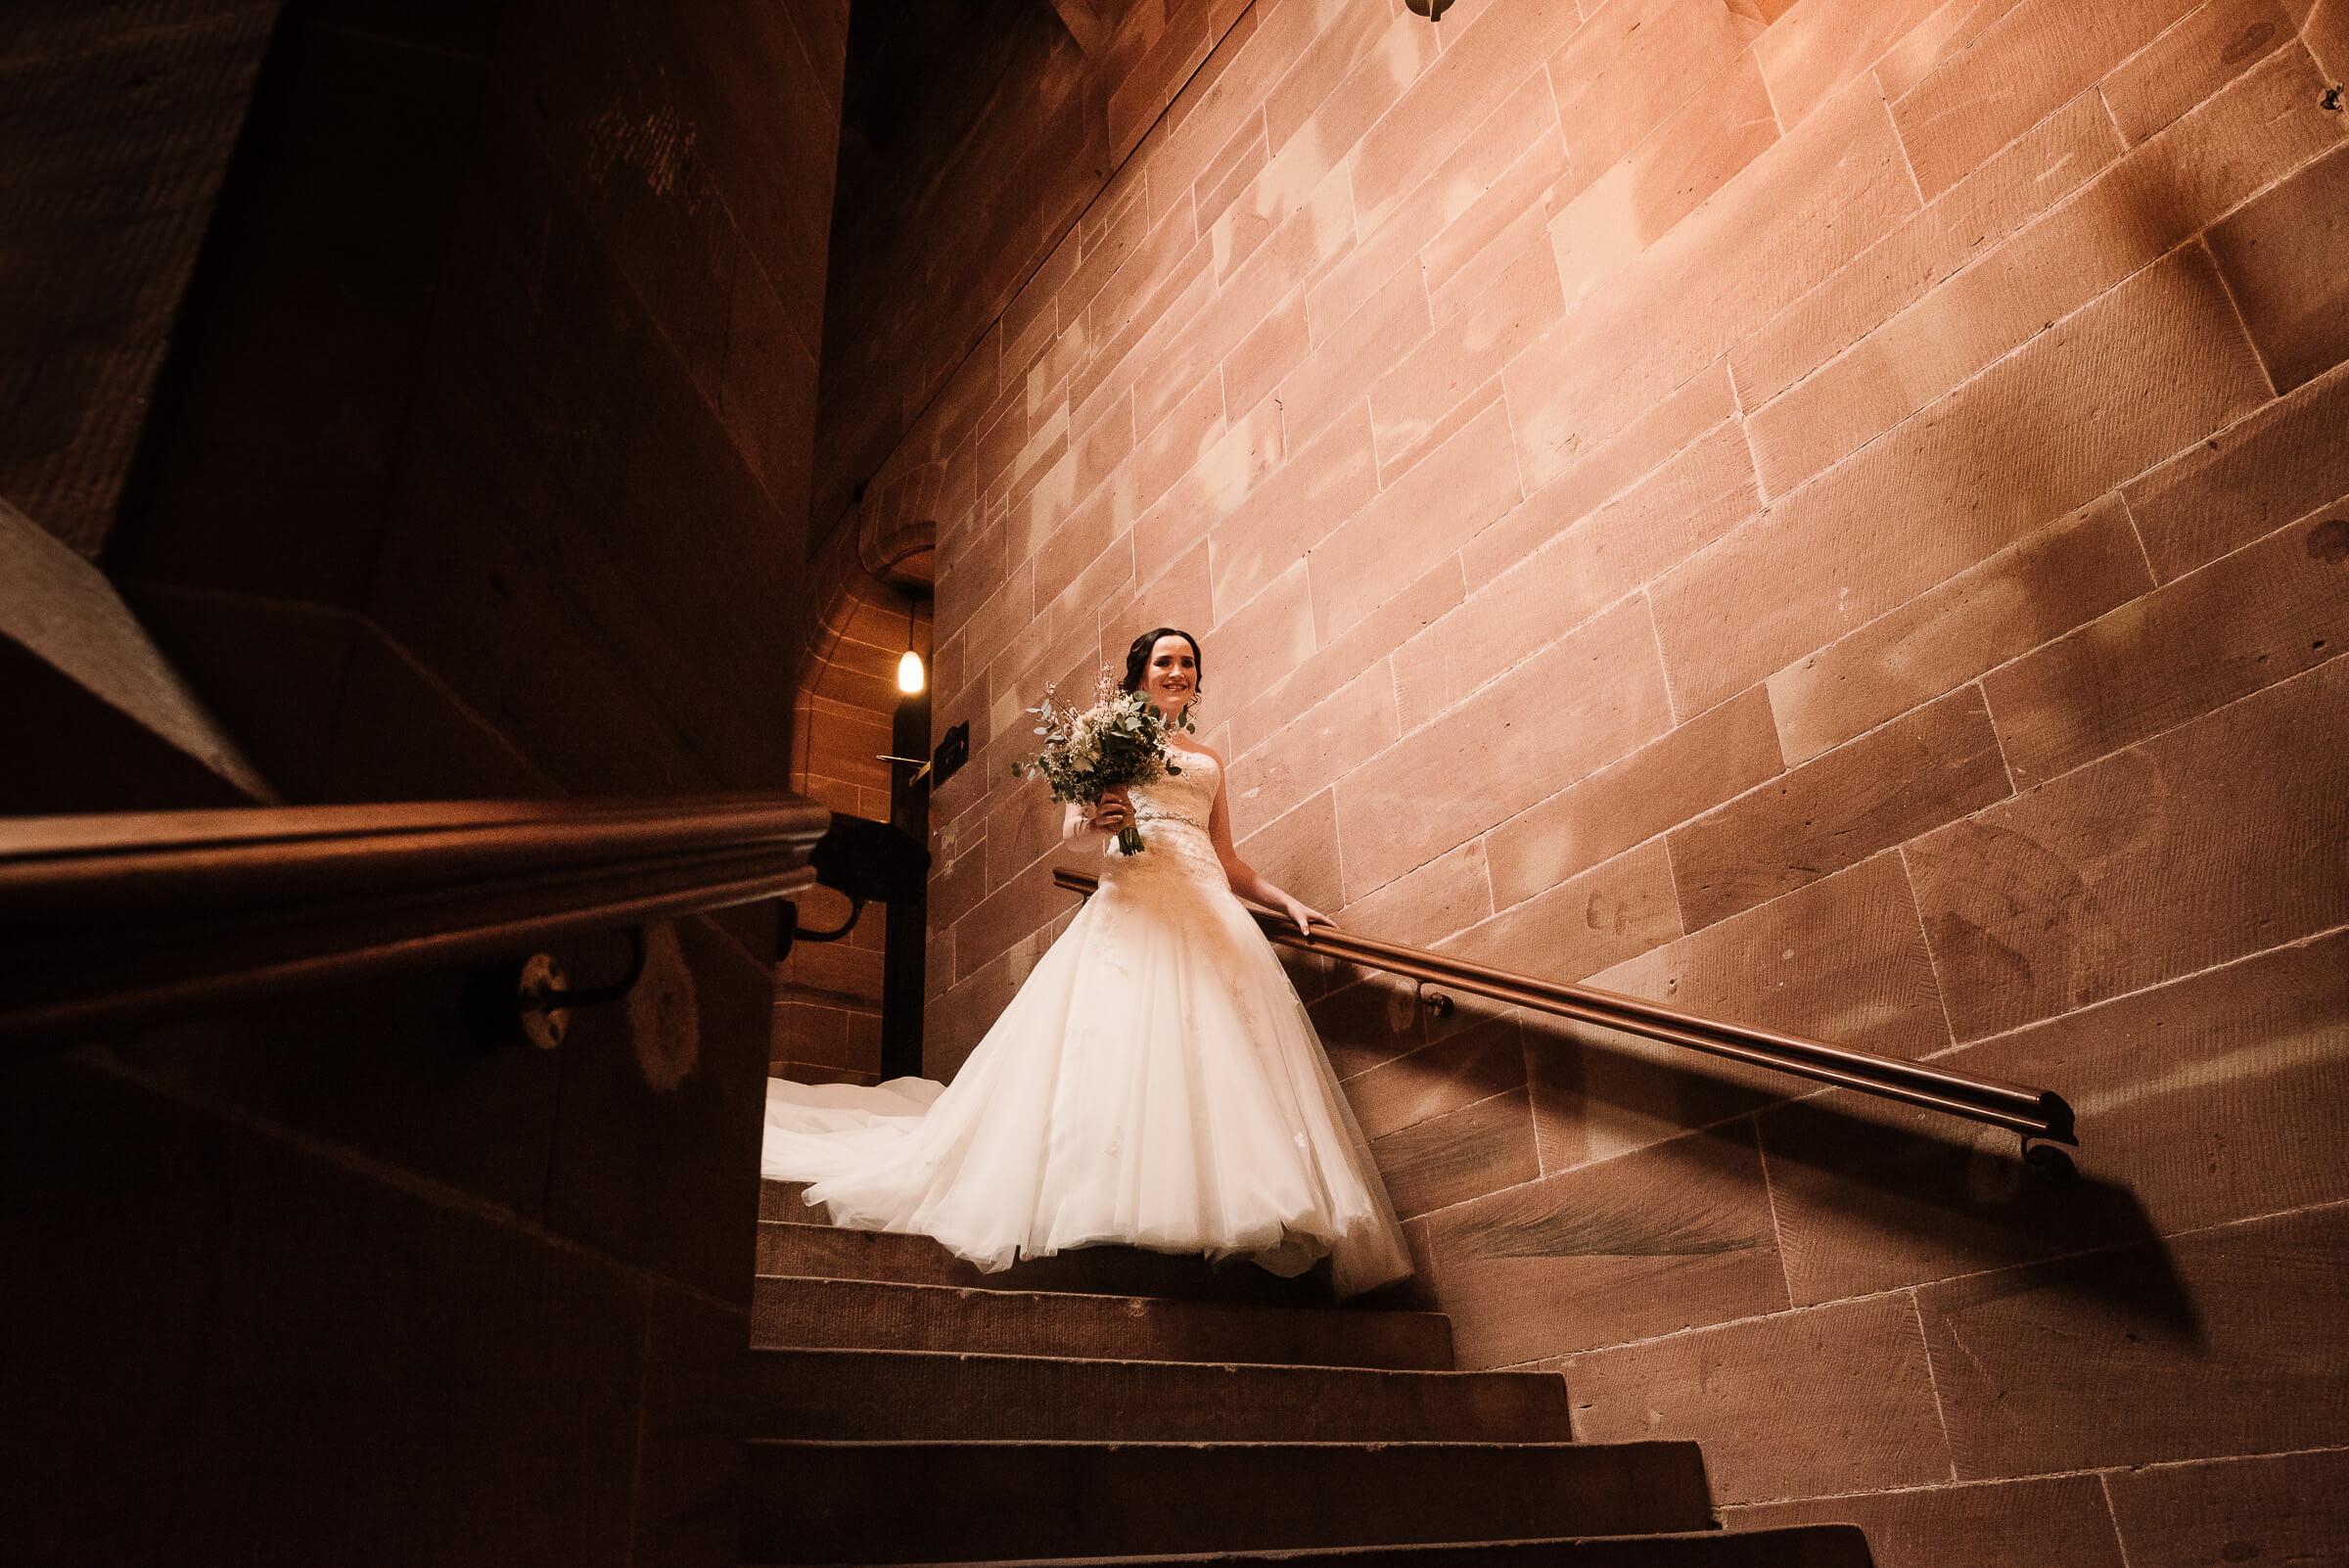 bride walking down stone staircase